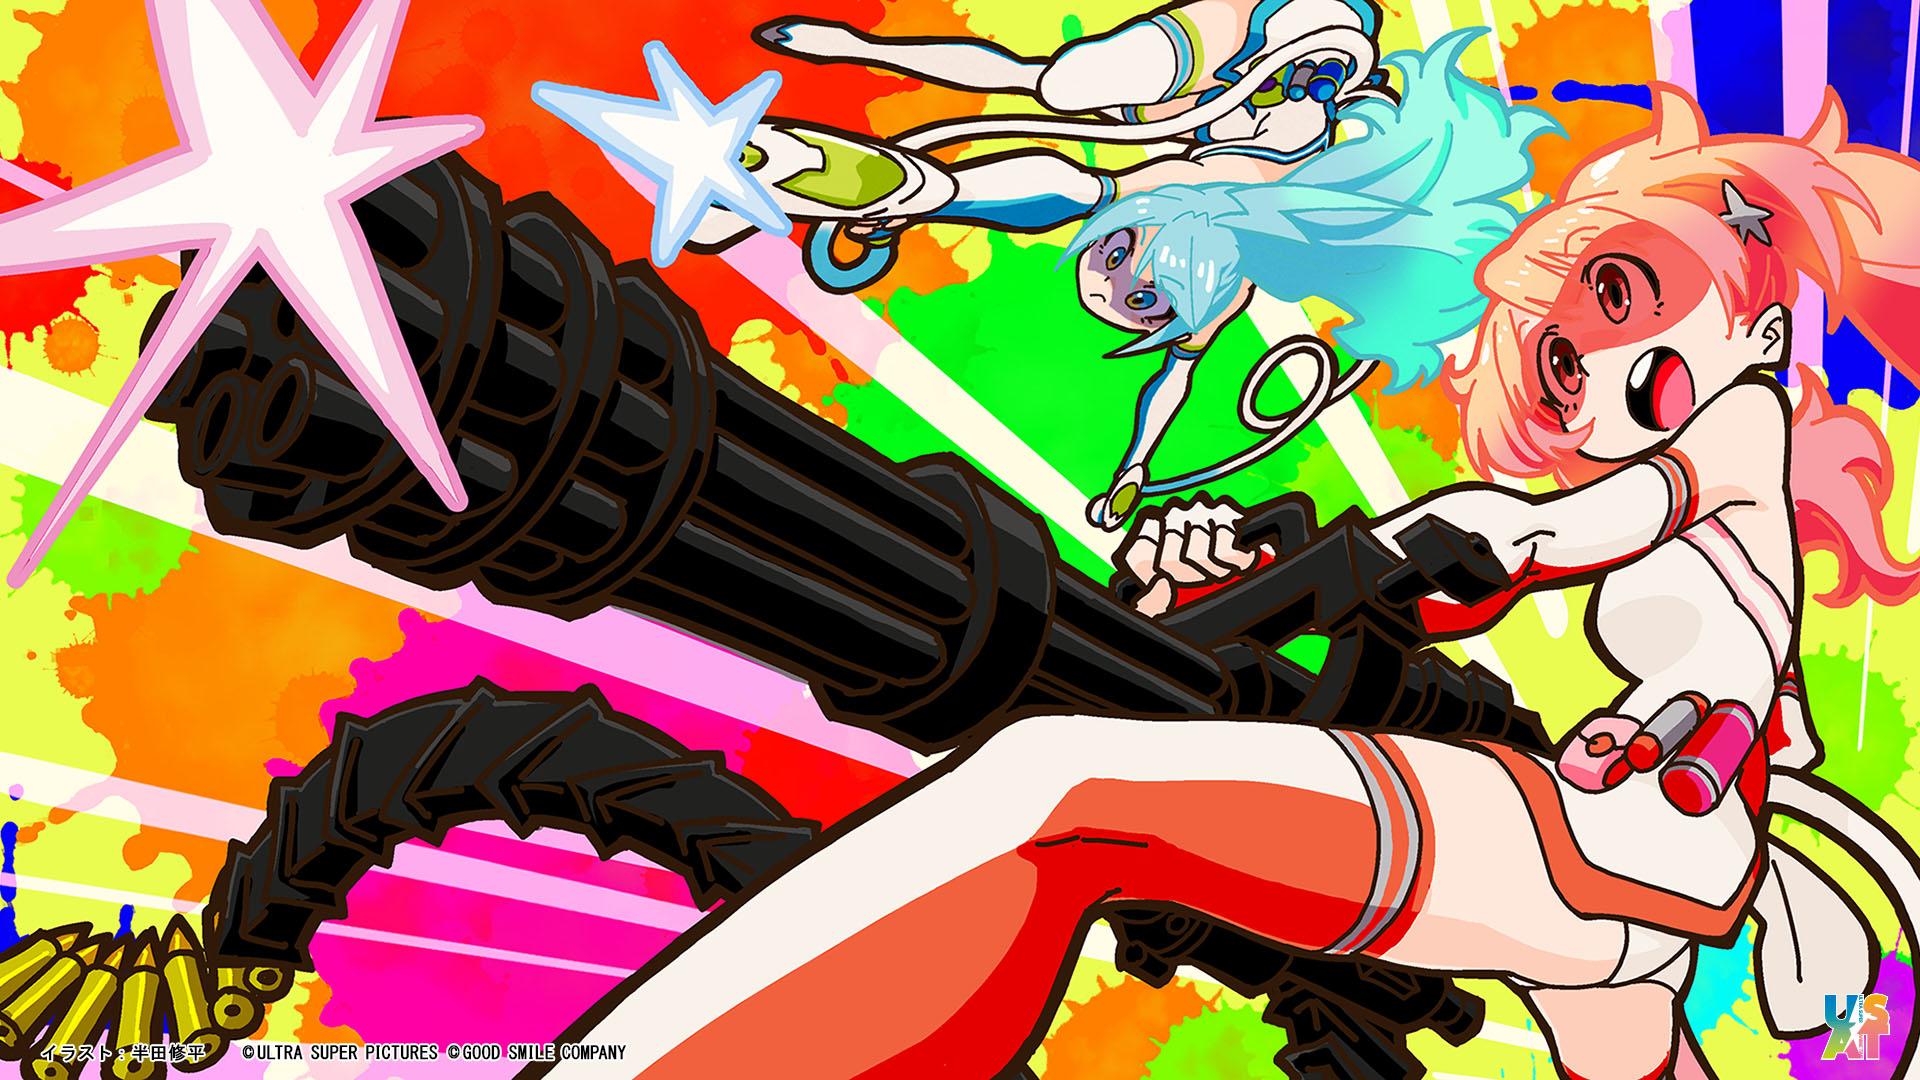 sumako and supika (ultra super anime time) drawn by handa shuuhei